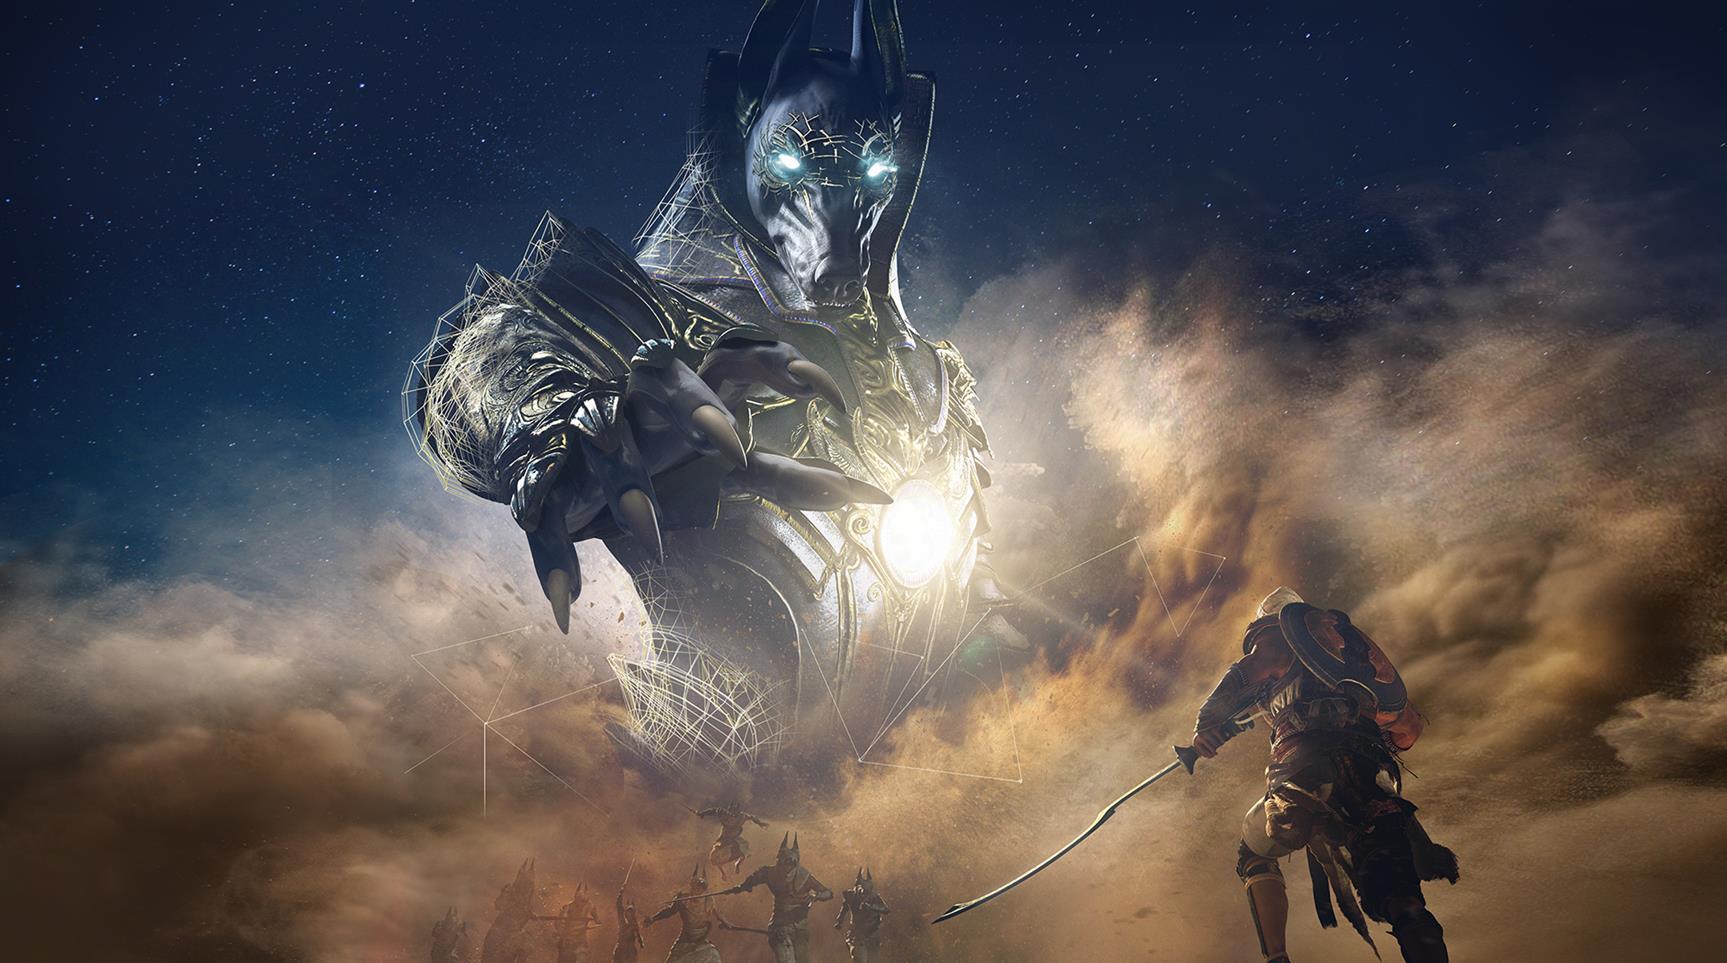 AssassinS Creed Origins Events Calendar January 2020 Assassin's Creed Origins Trials of the Gods Release Details & What